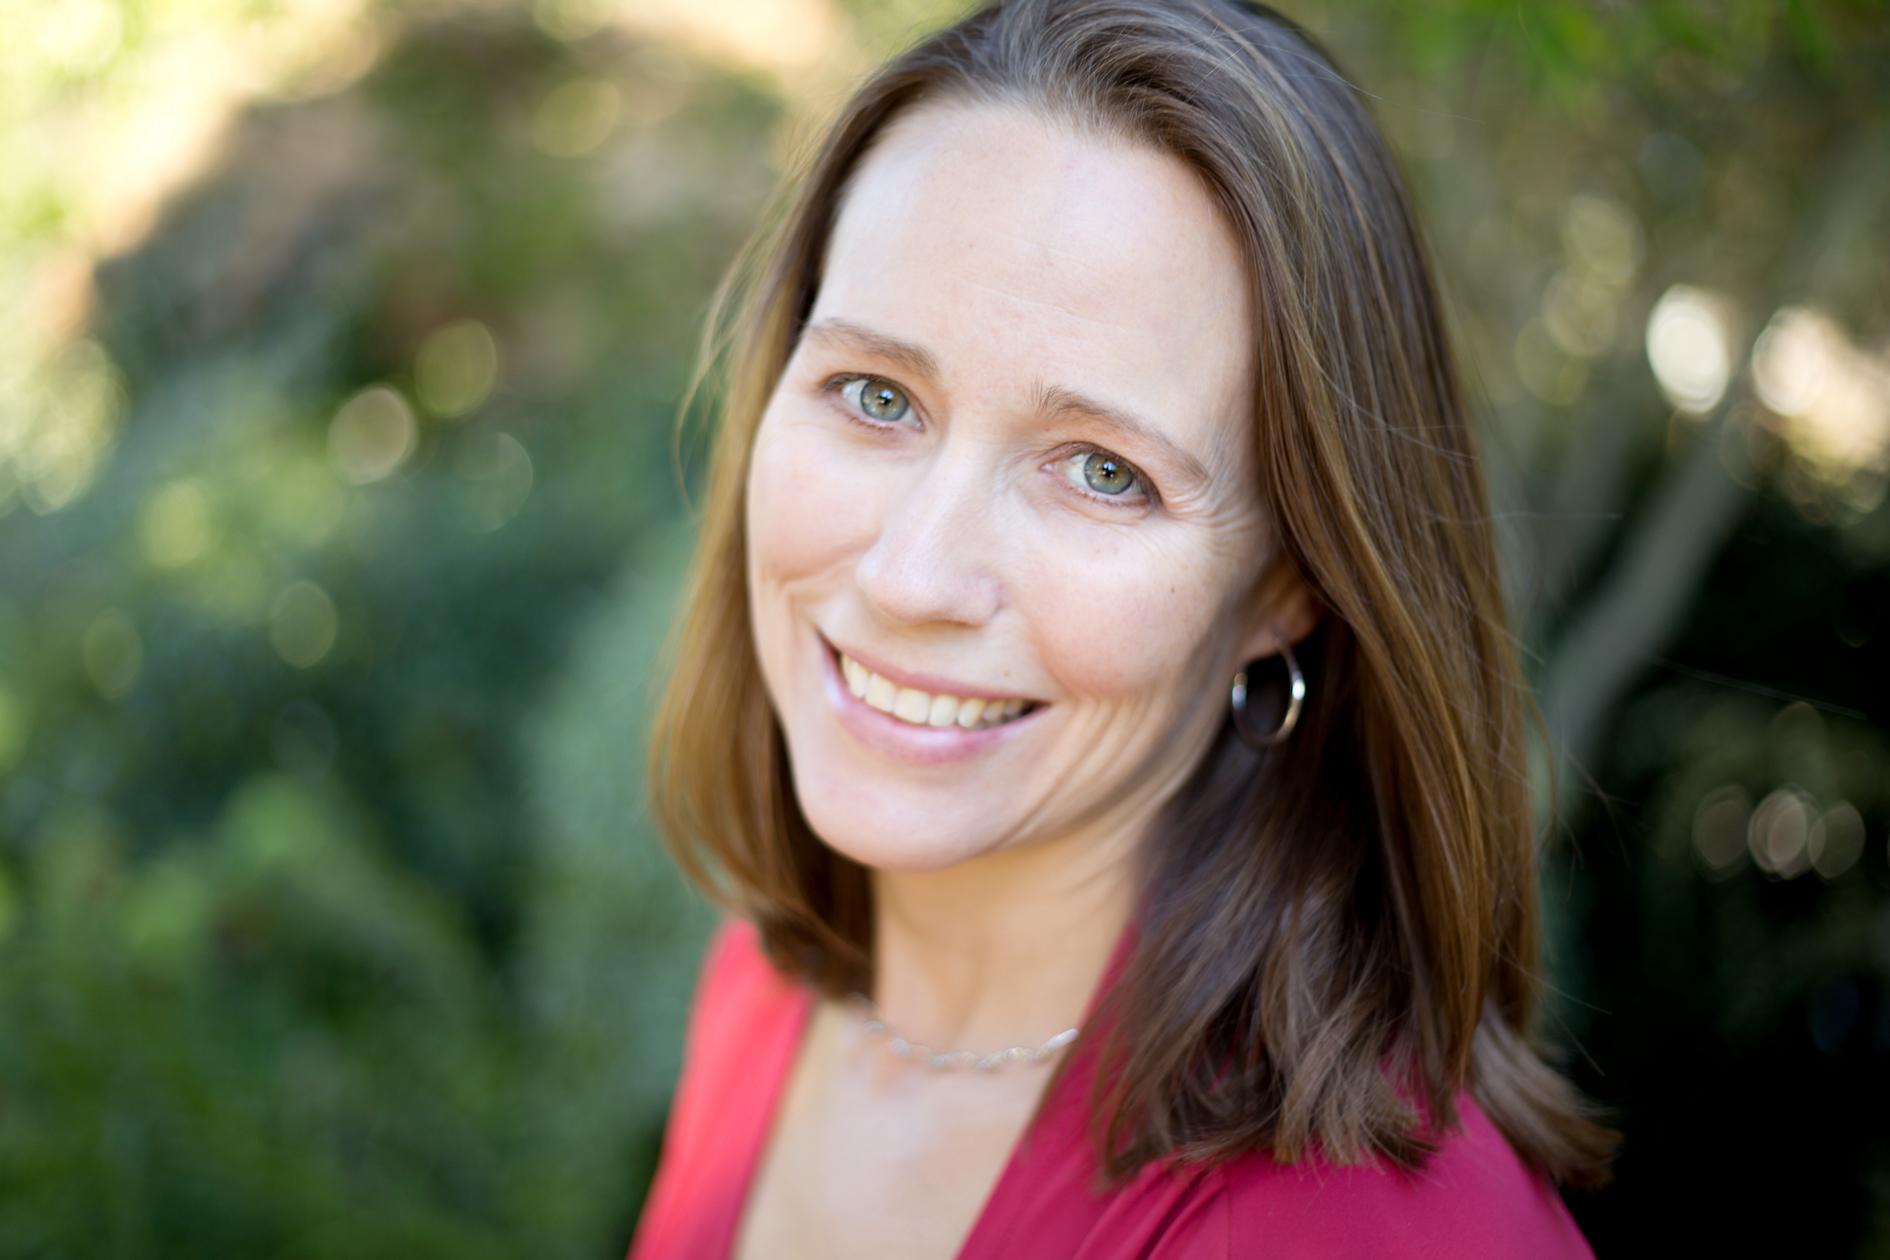 Tanya Sheckley